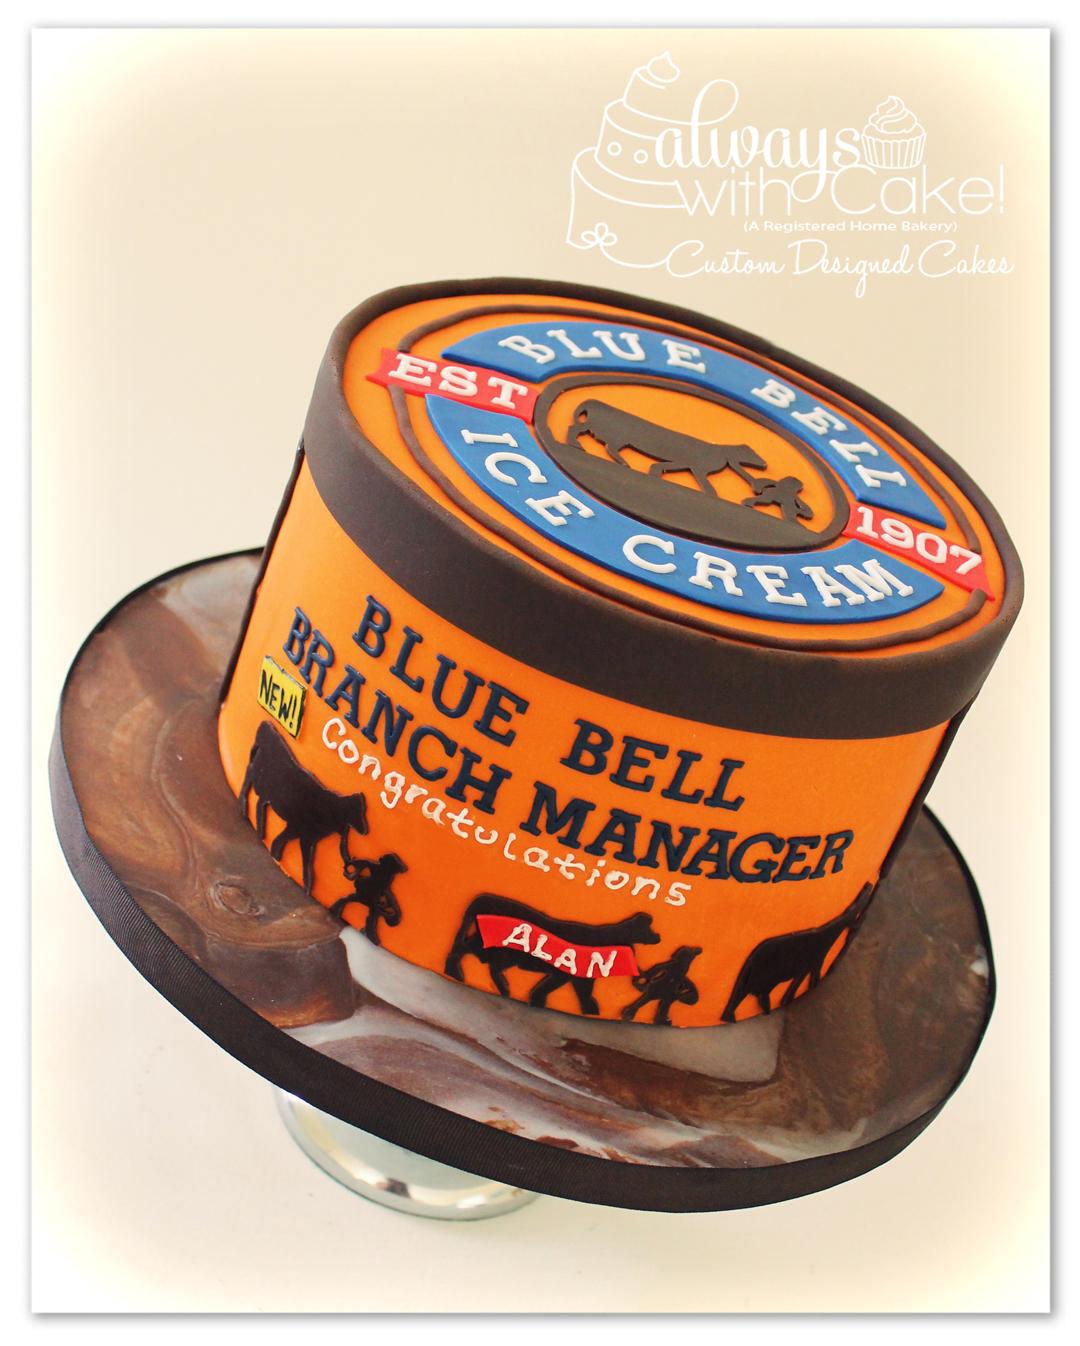 Blue Bell Ice Cream Tub Cake